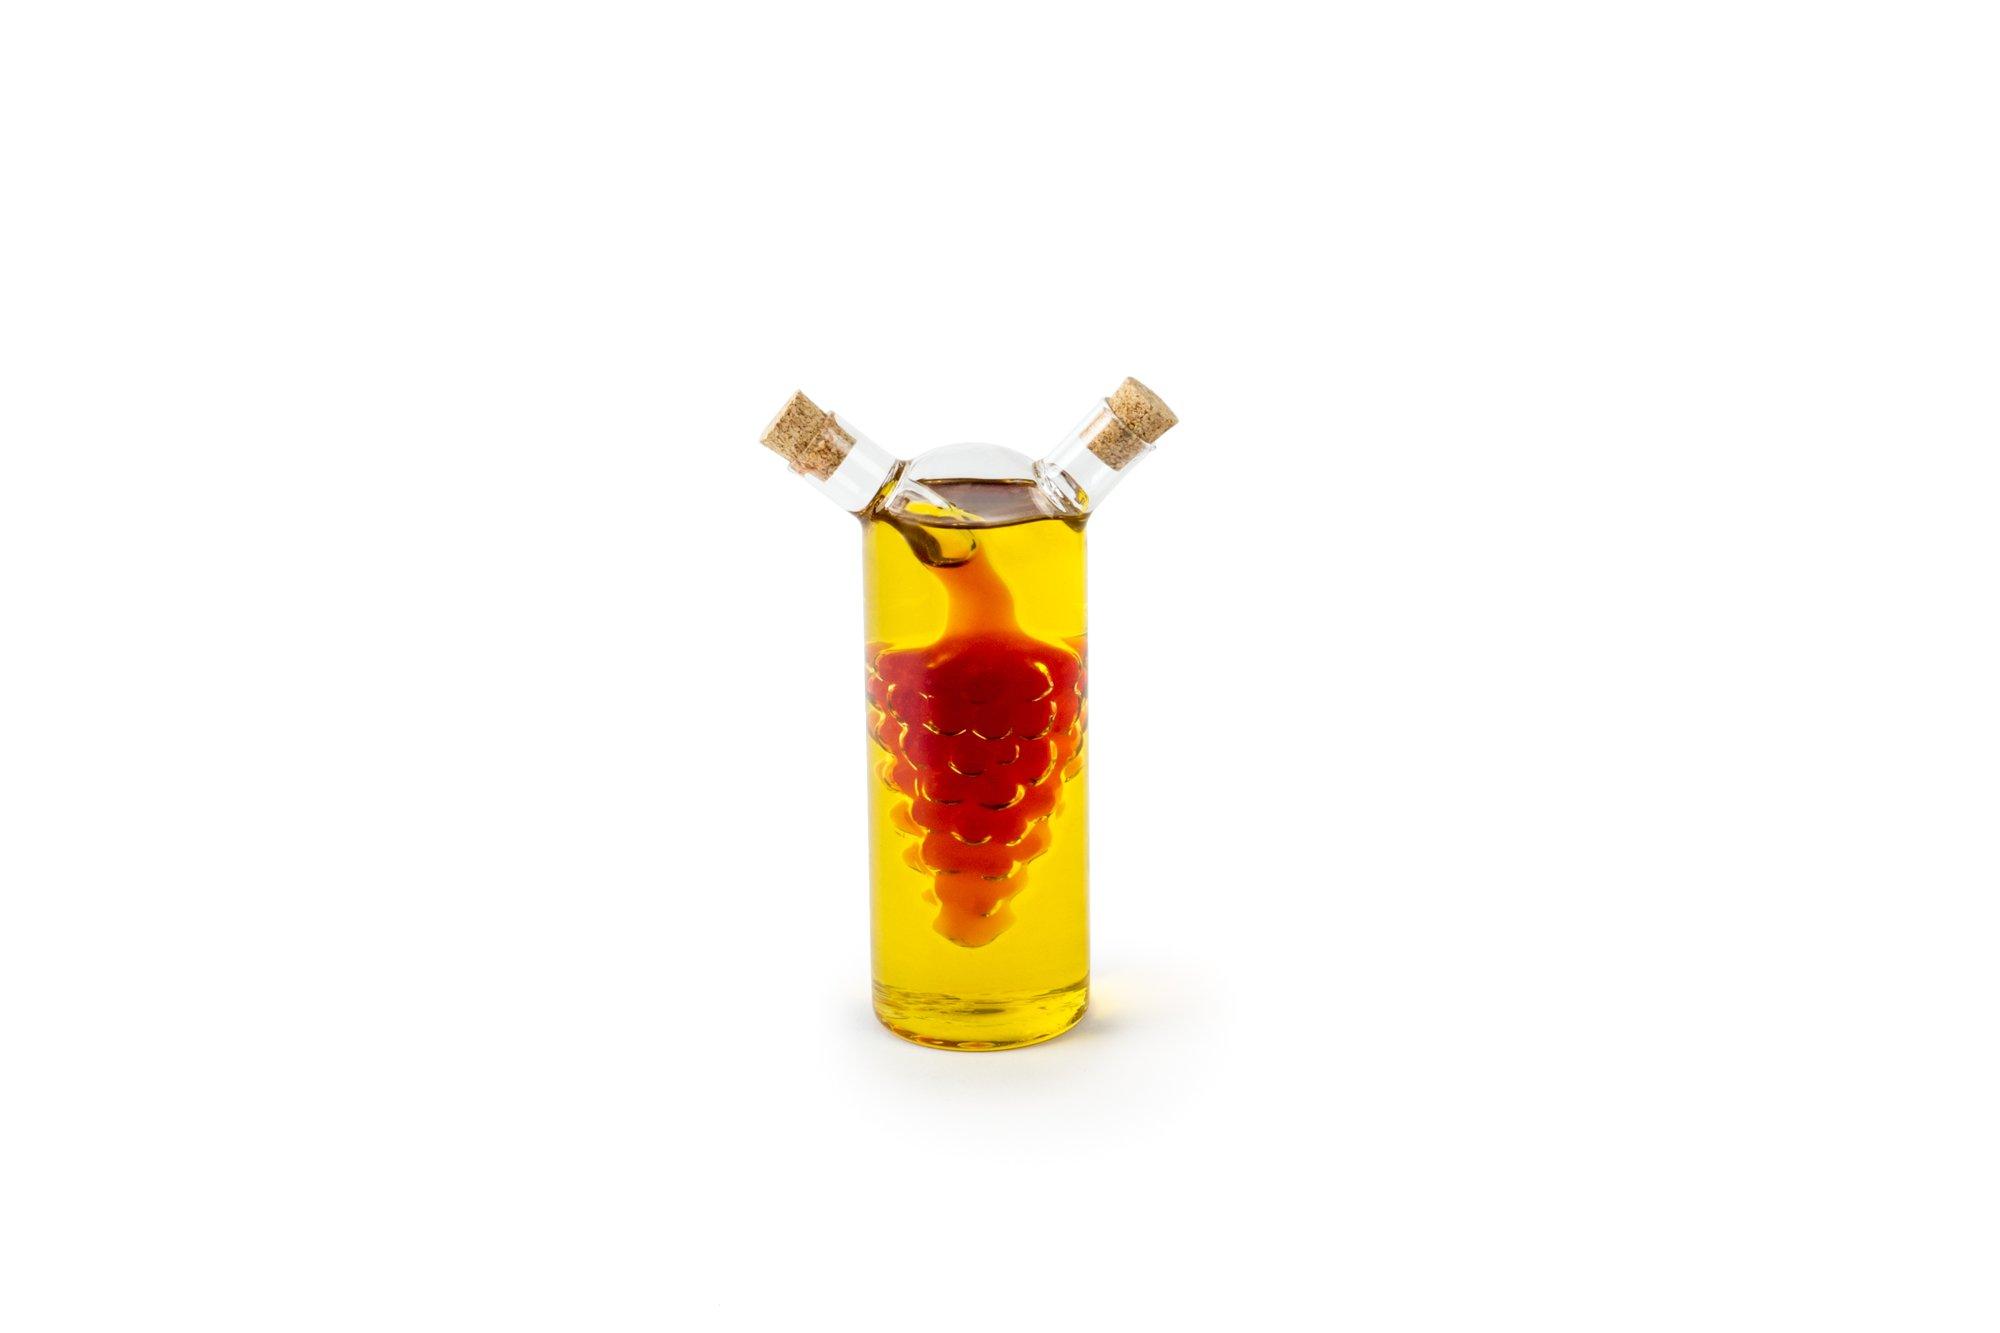 Fox Run 7050 Oil and Vinegar Bottle, Glass, Grape Motif